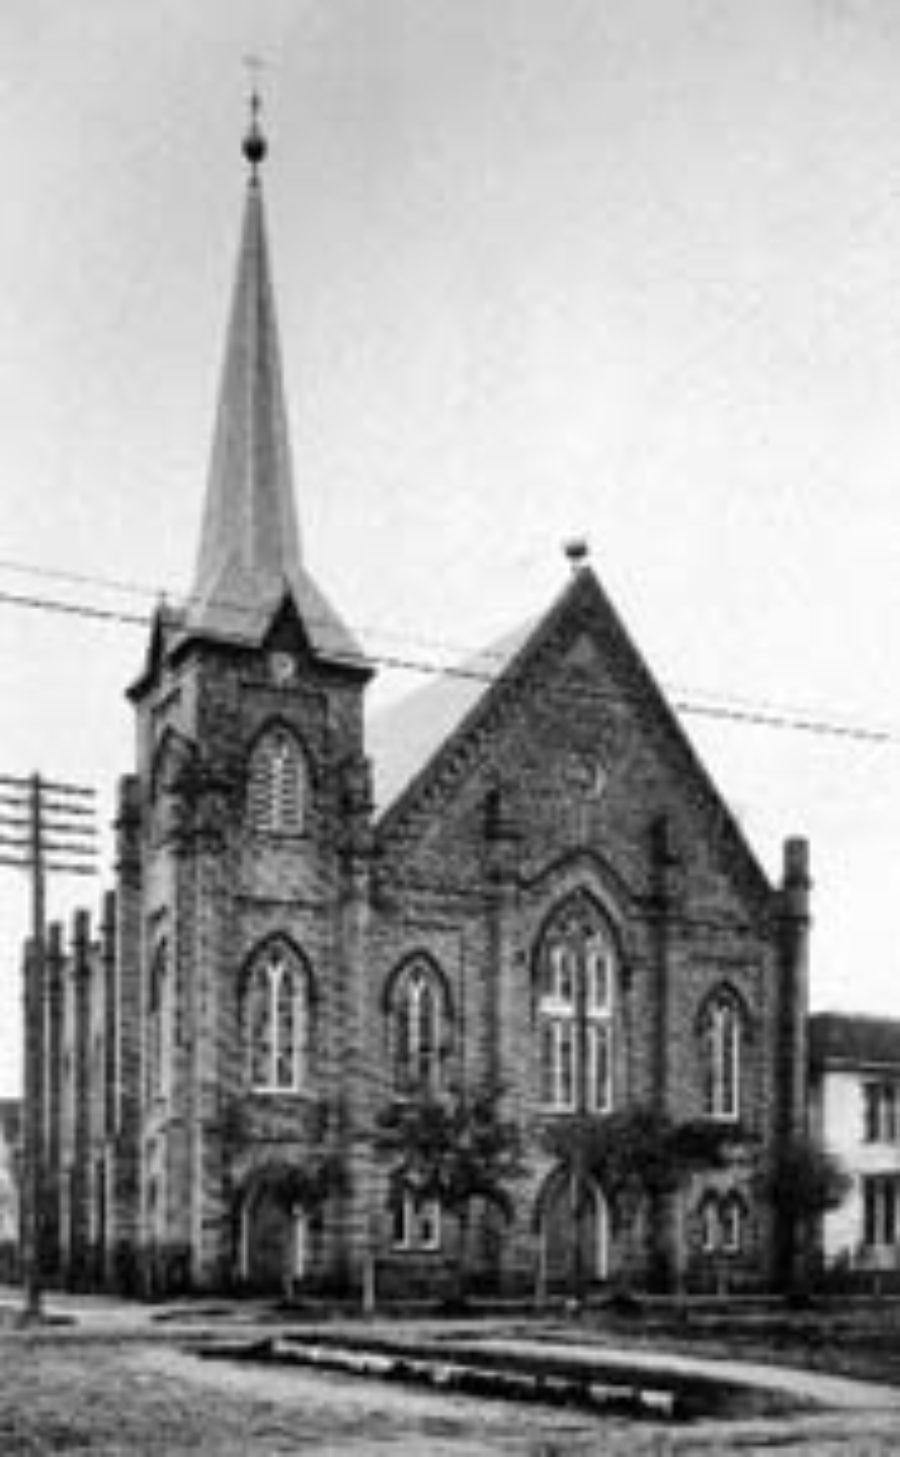 AW-45(l) St. John's Church